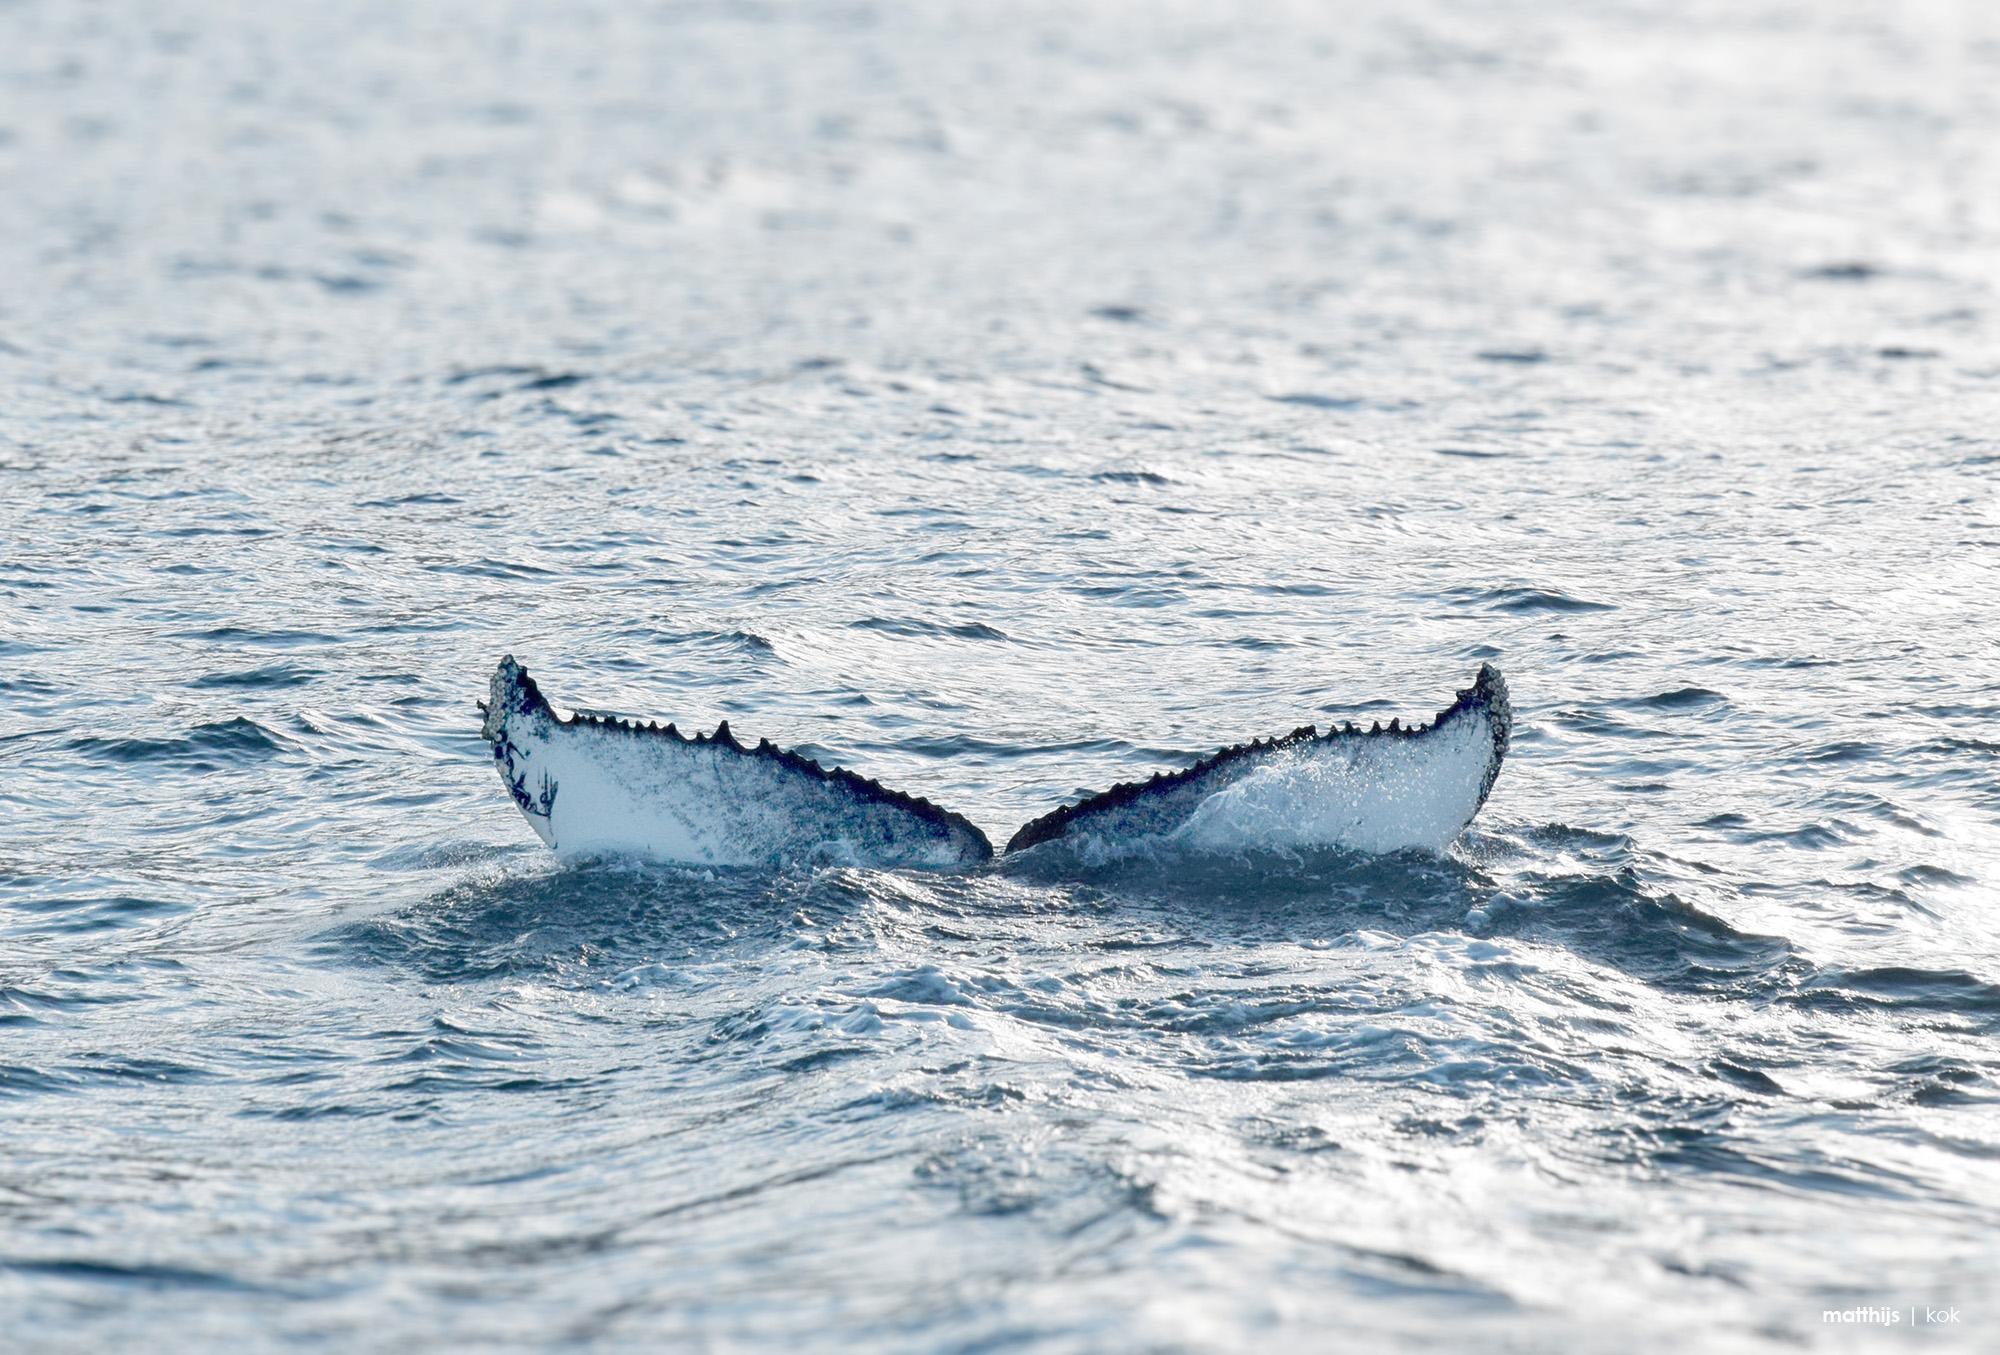 Whale in the Faxaflói Bay, Reykjavik, Iceland | Photo by Matthijs Kok